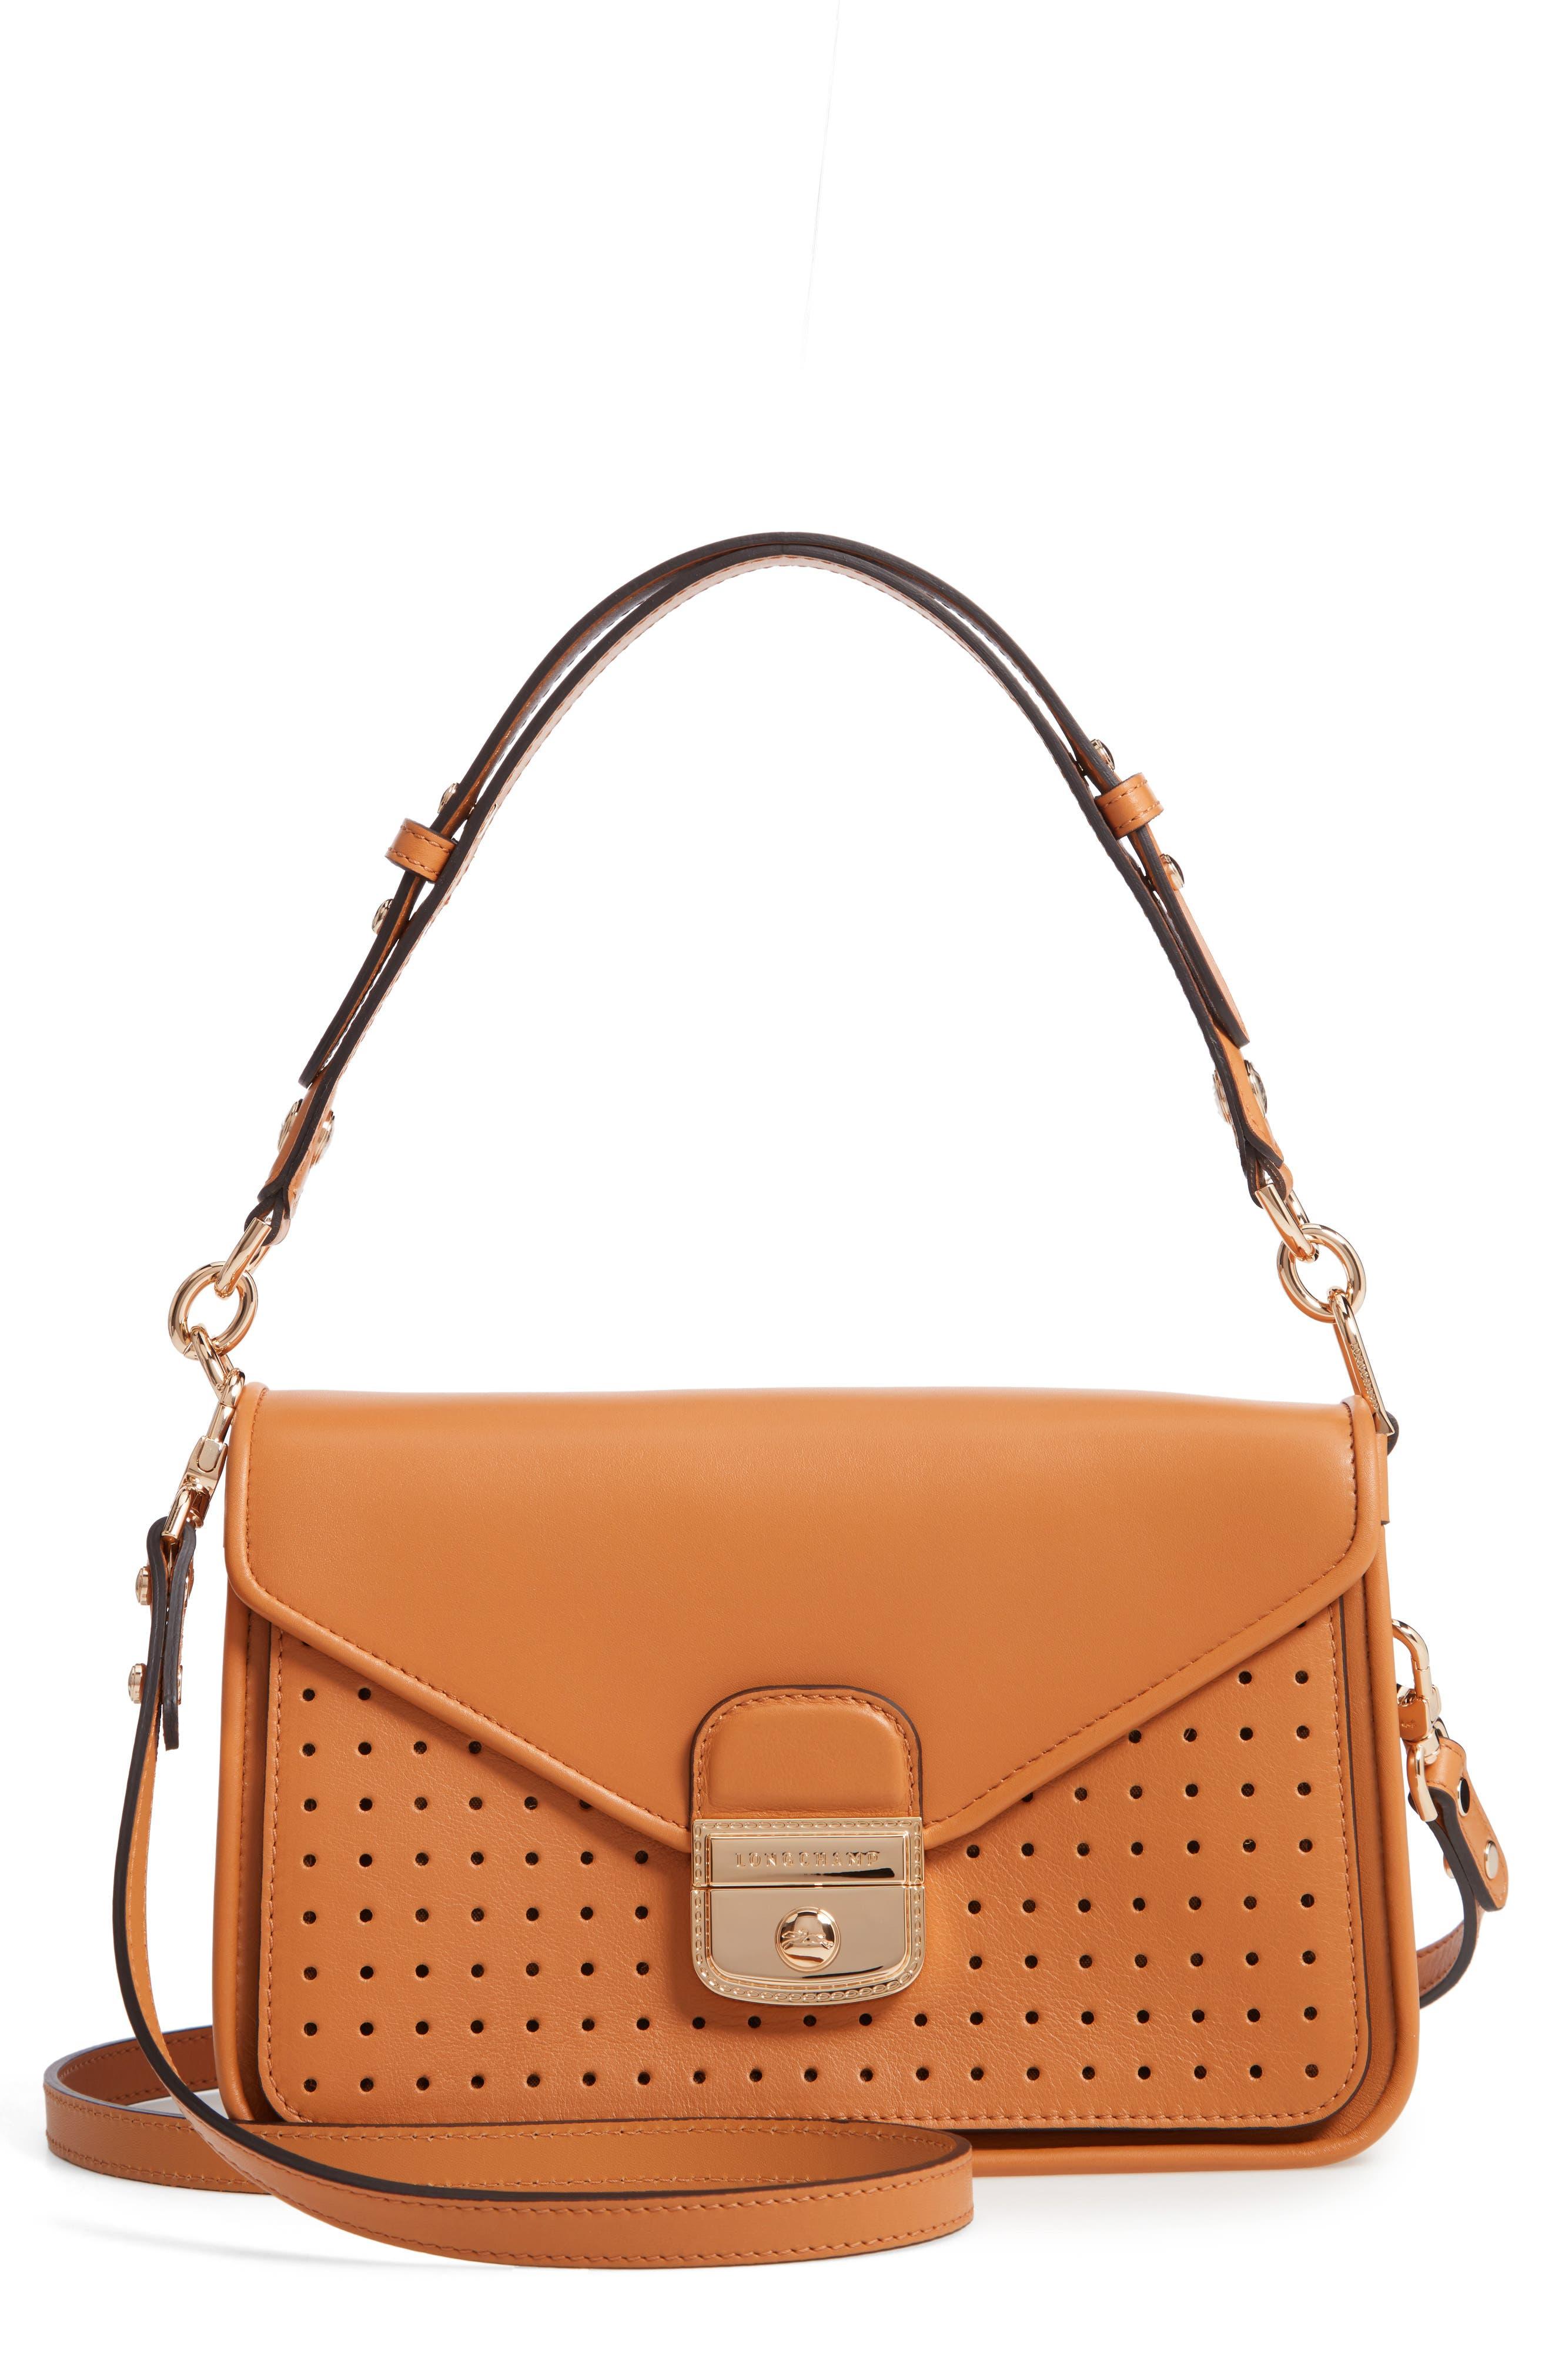 Mademoiselle Calfskin Leather Crossbody Bag,                             Main thumbnail 1, color,                             Honey